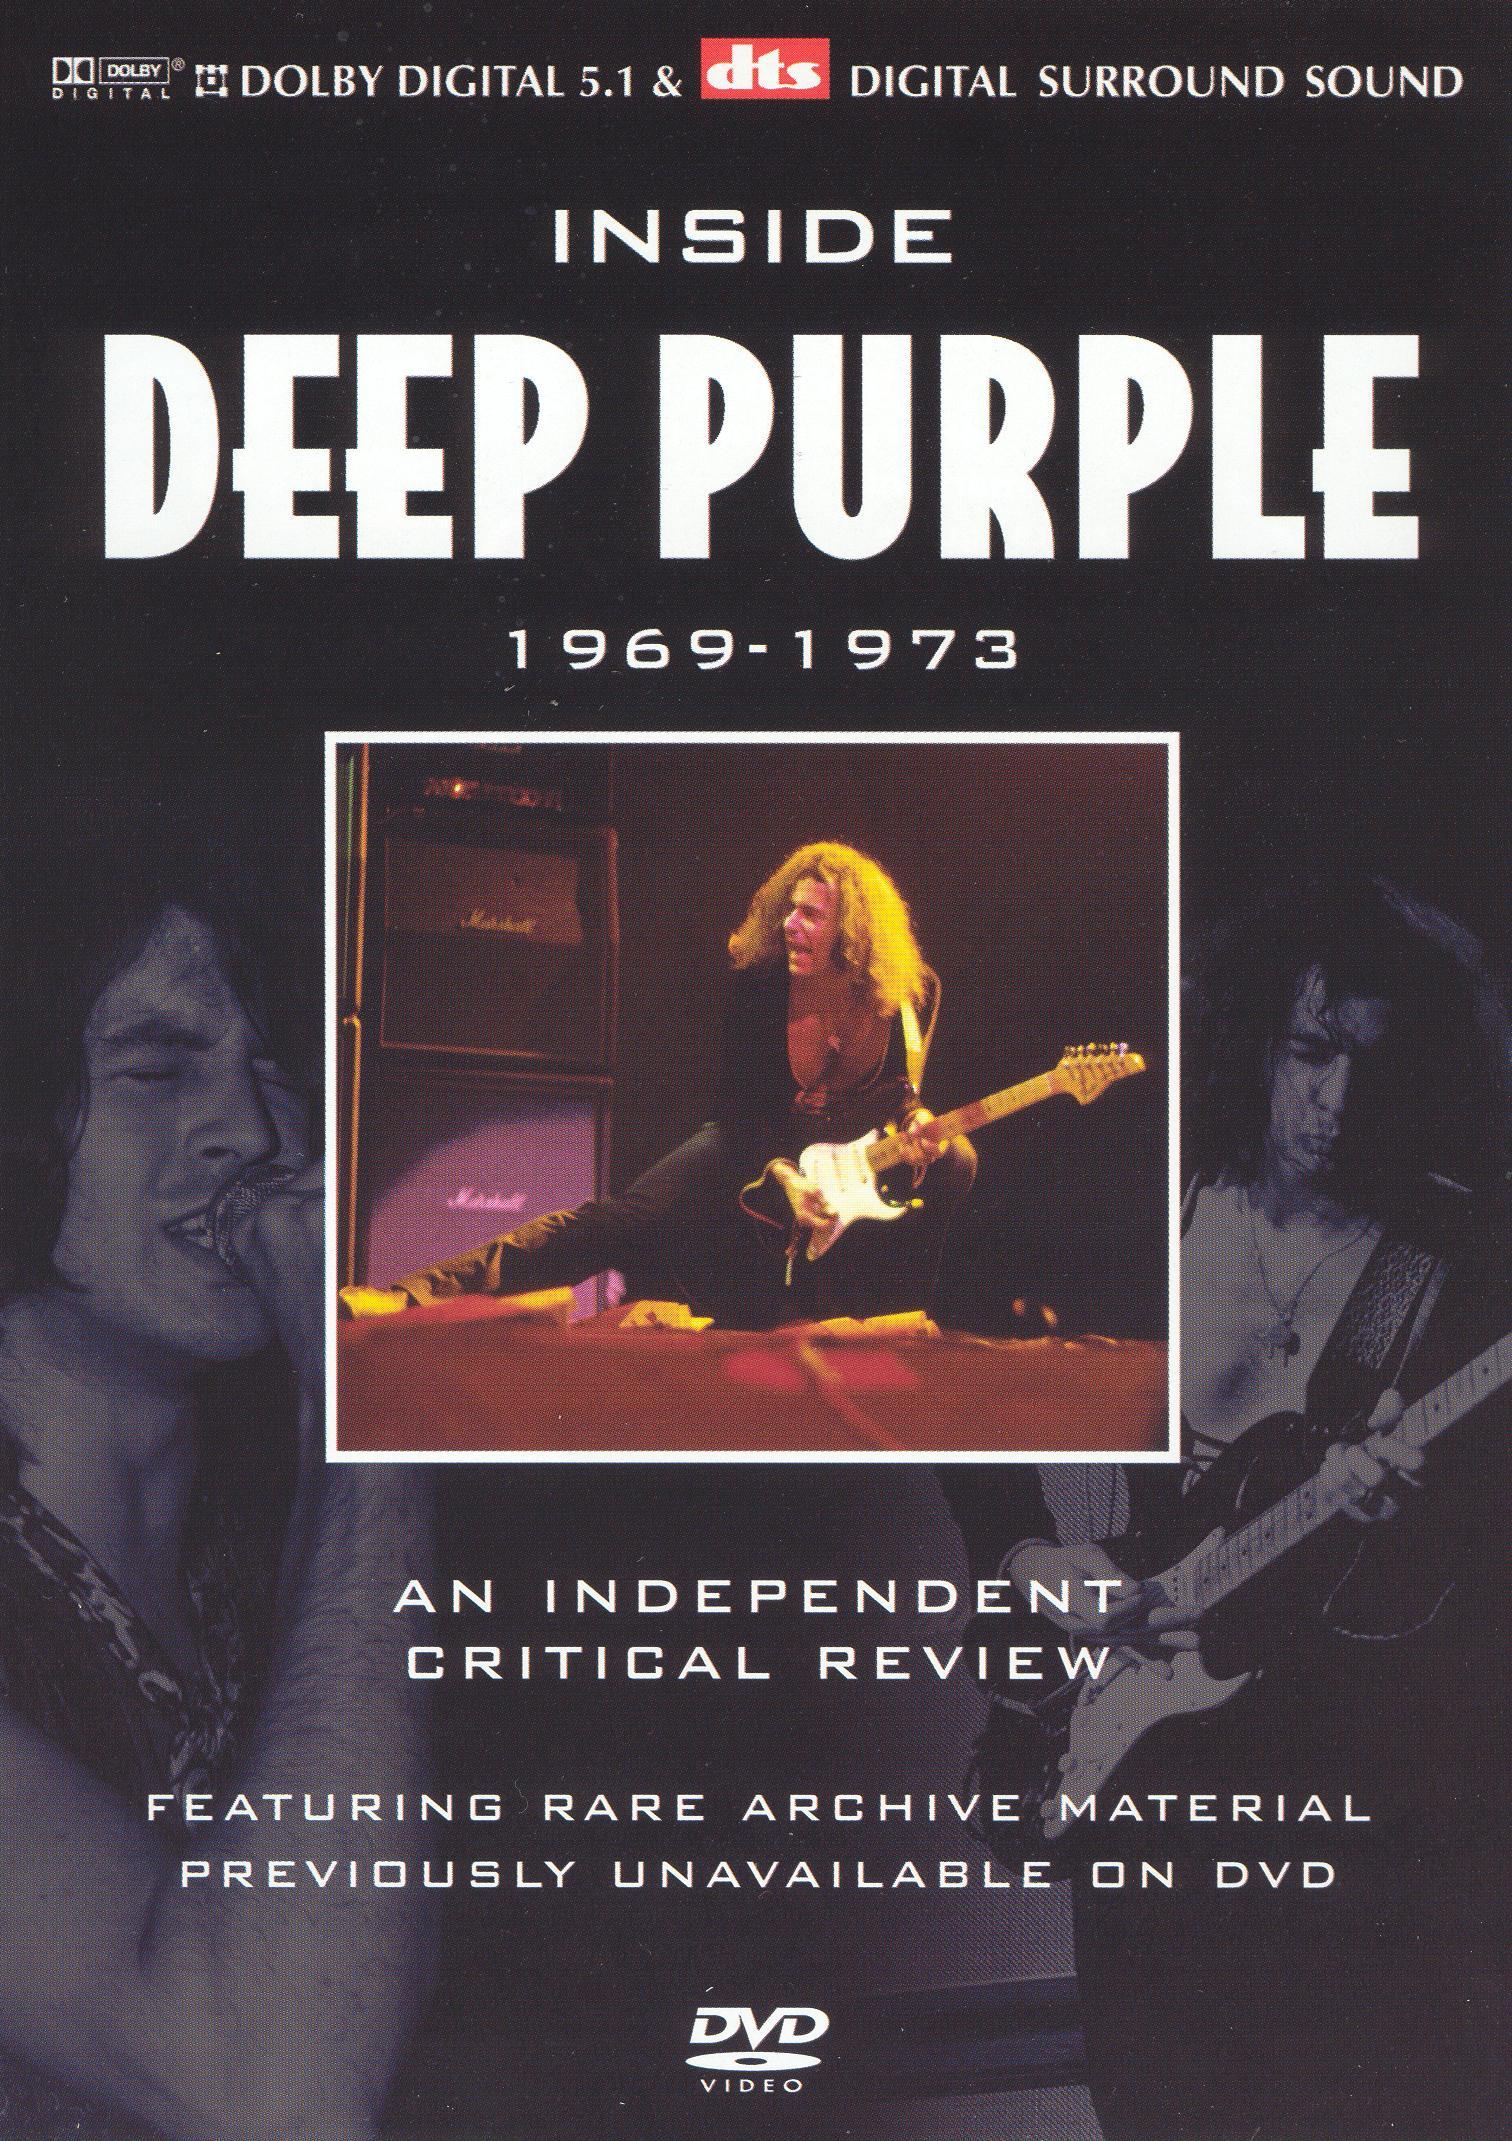 Inside Deep Purple: A Critical Review 1969-1973